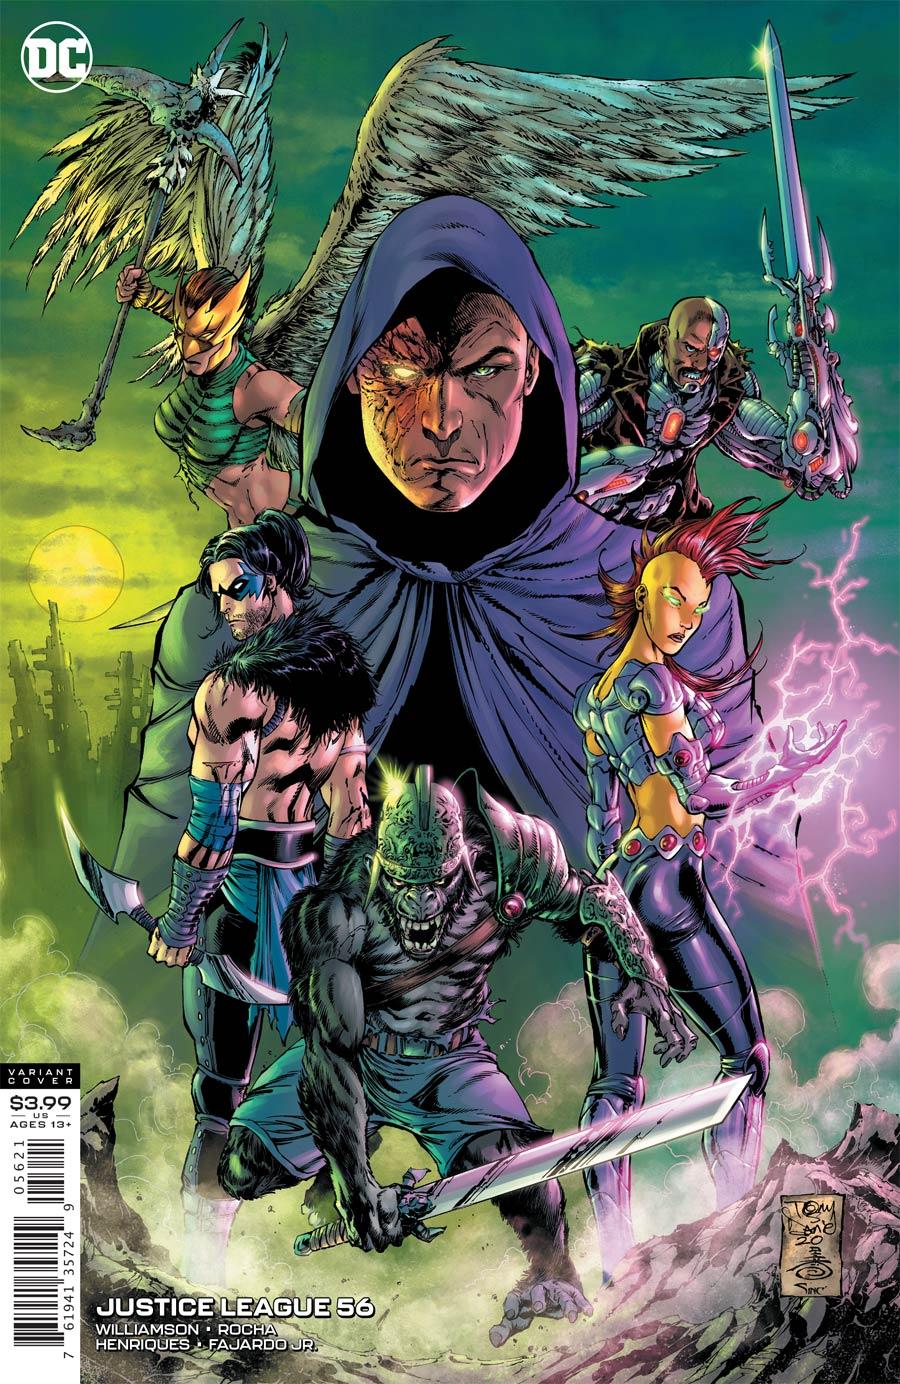 Justice League Vol 4 #56 Cover B Variant Tony S Daniel & Danny Miki Cover (Dark Nights Death Metal Tie-In)